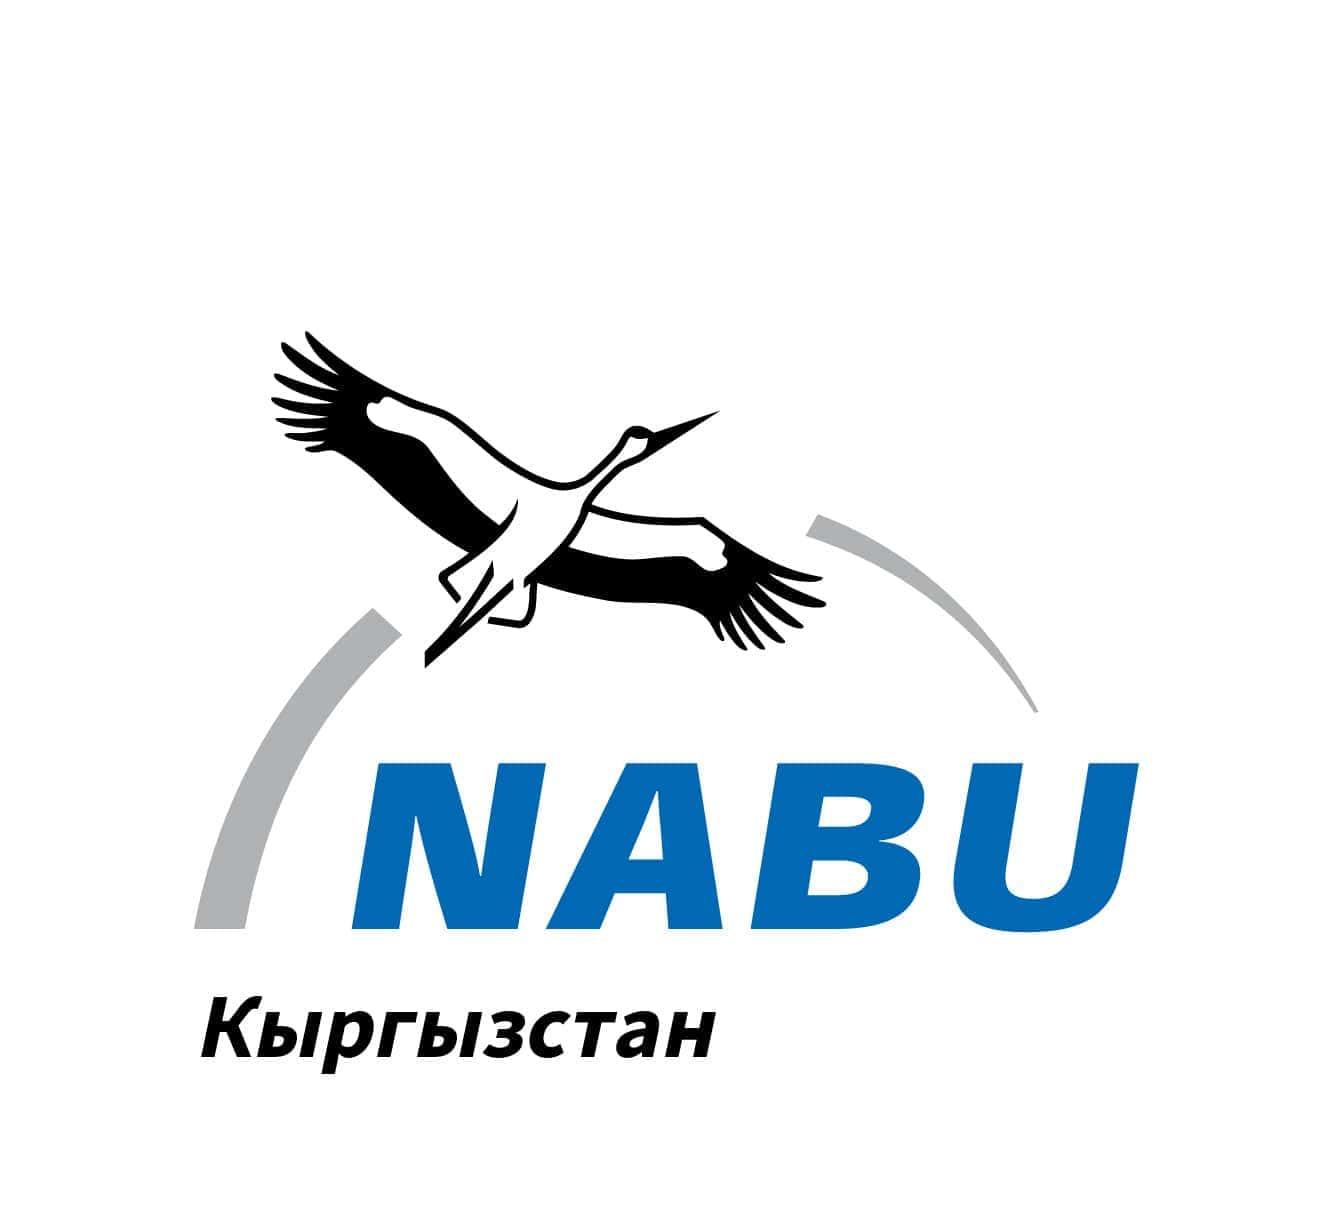 https://nabu.kg/wp-content/uploads/2021/01/NABU_Kirgistan_kyrillisch_RGB_01_bb-min-2.jpg